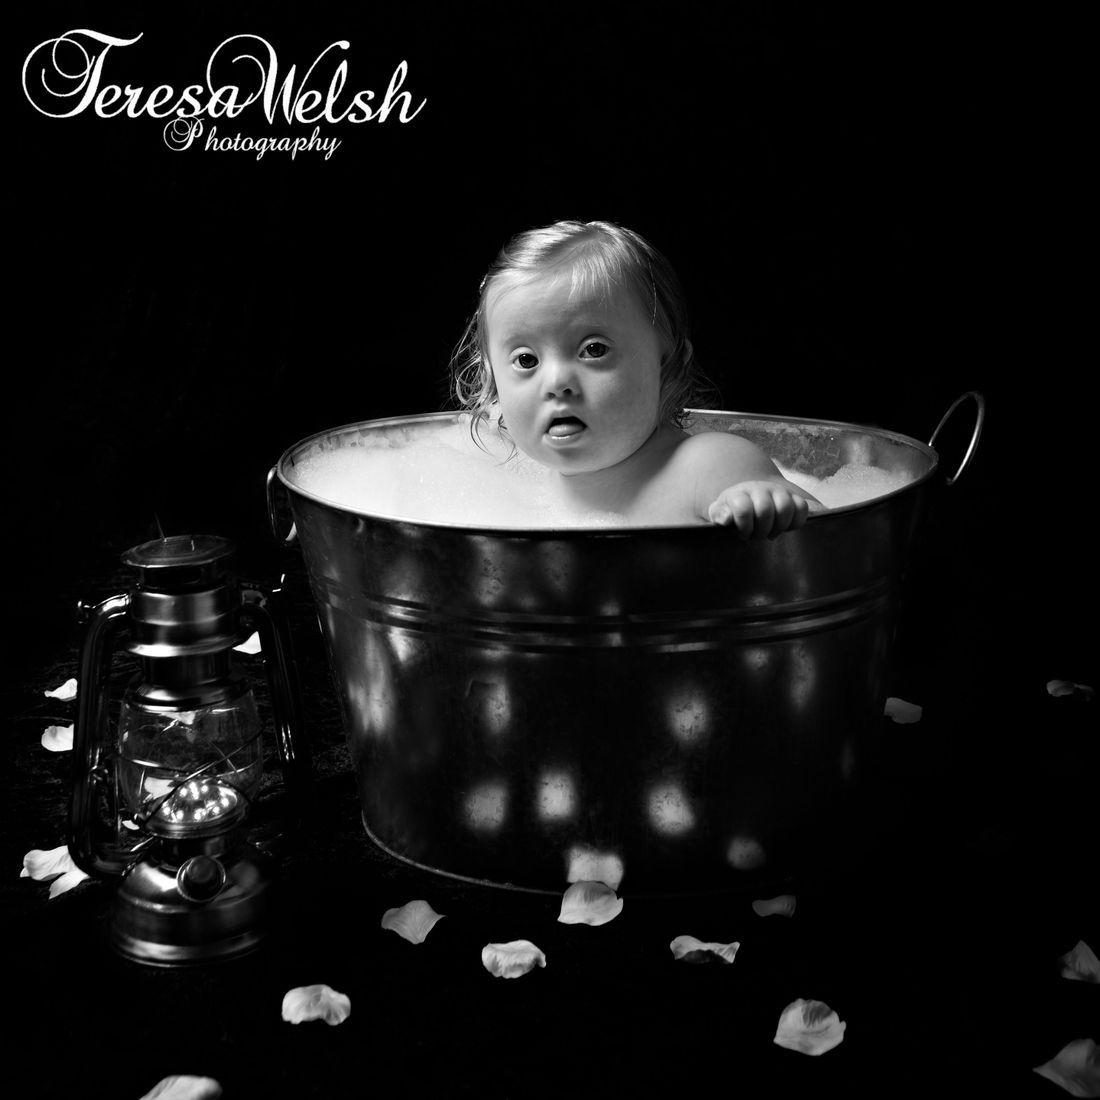 bubble bath, sitter portraits, beautiful baby photos,